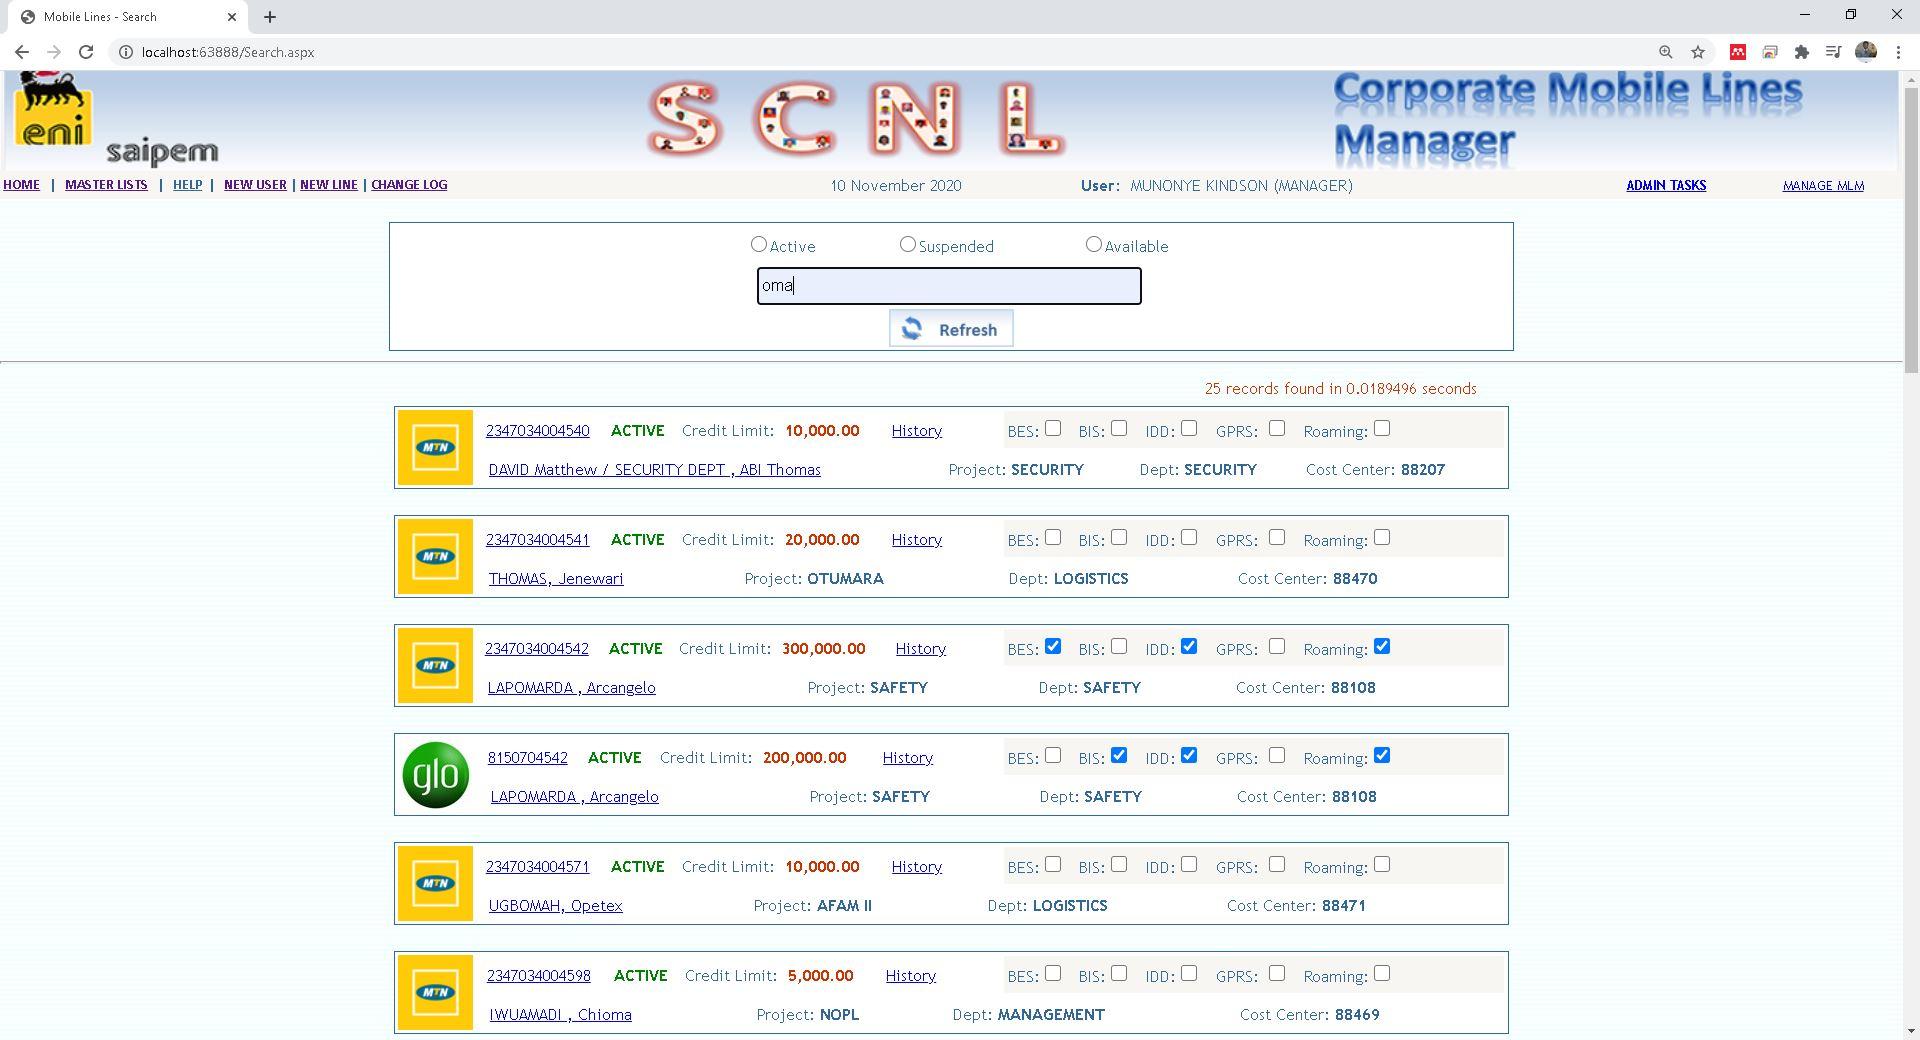 Saipem Mobile Services Management System